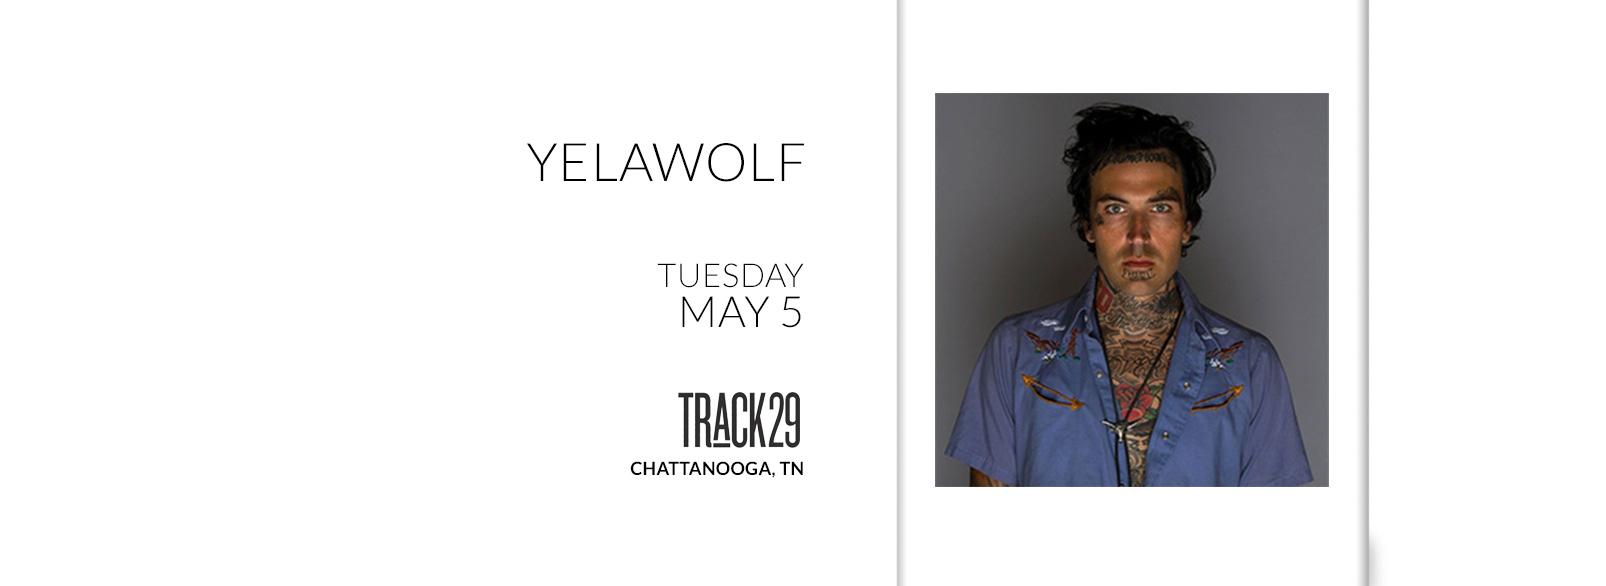 Yelawolf @ Track 29